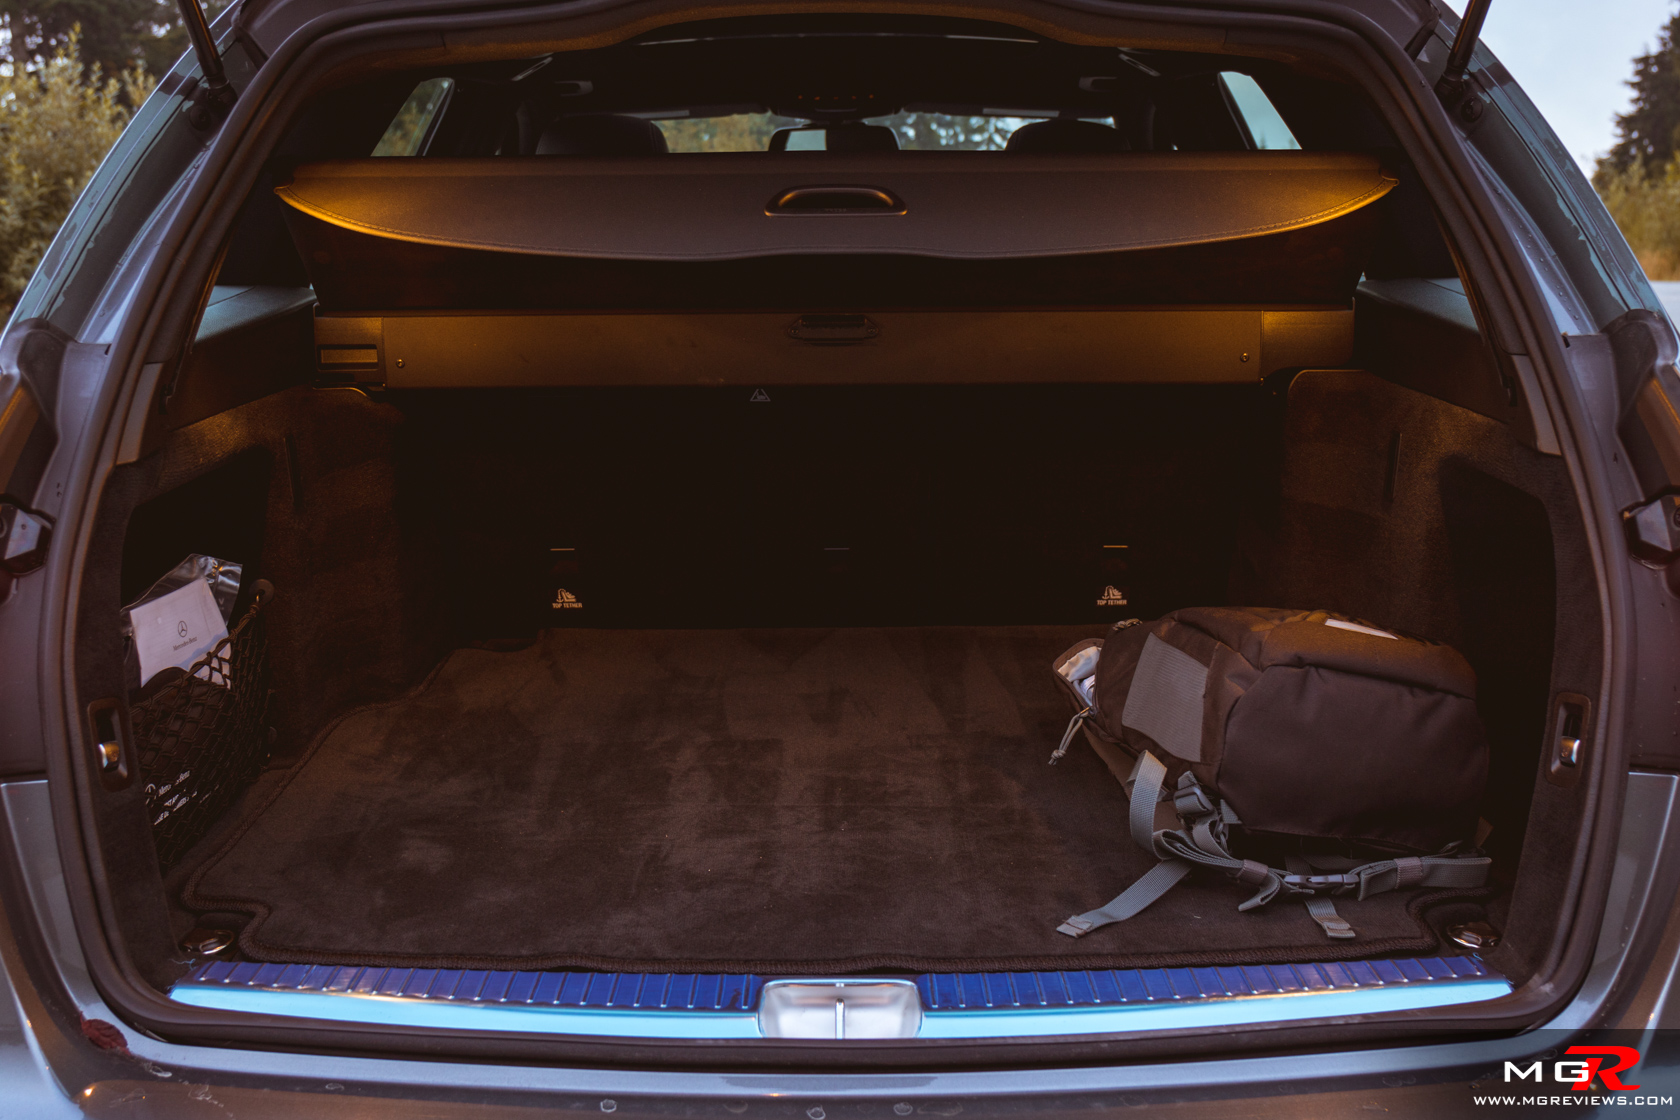 Review: 2018 Mercedes-Benz C300 Wagon – M G Reviews